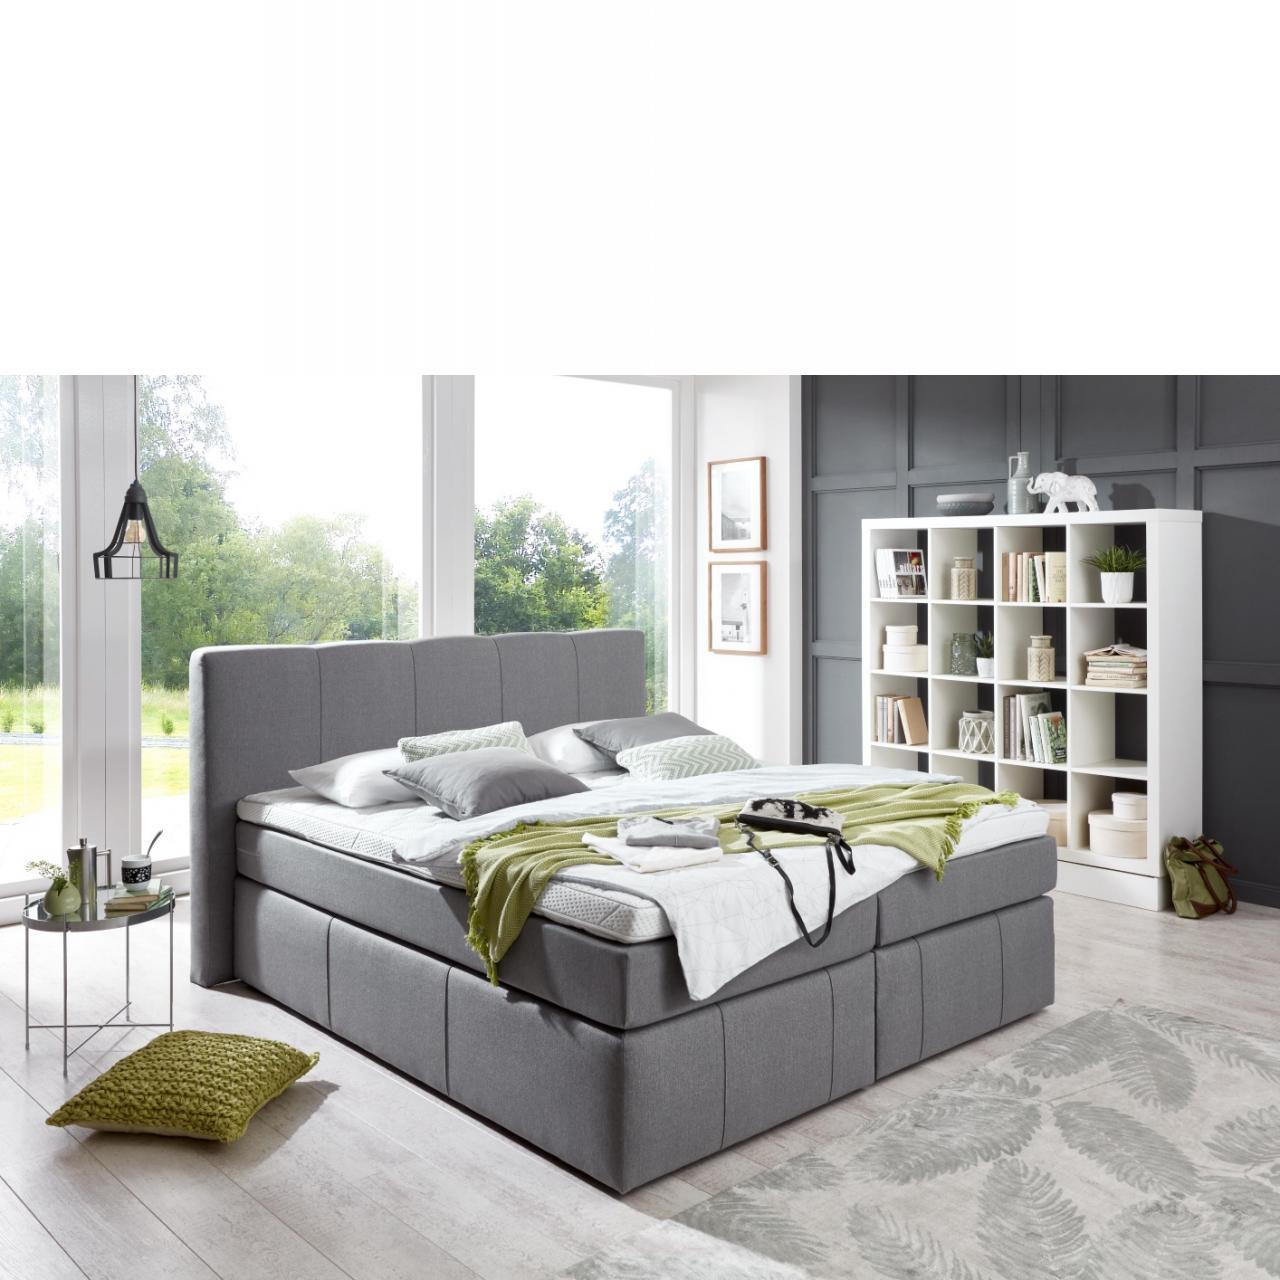 boxspringbett 1460 boxspringbett betten schlafen m bel j hnichen center gmbh. Black Bedroom Furniture Sets. Home Design Ideas